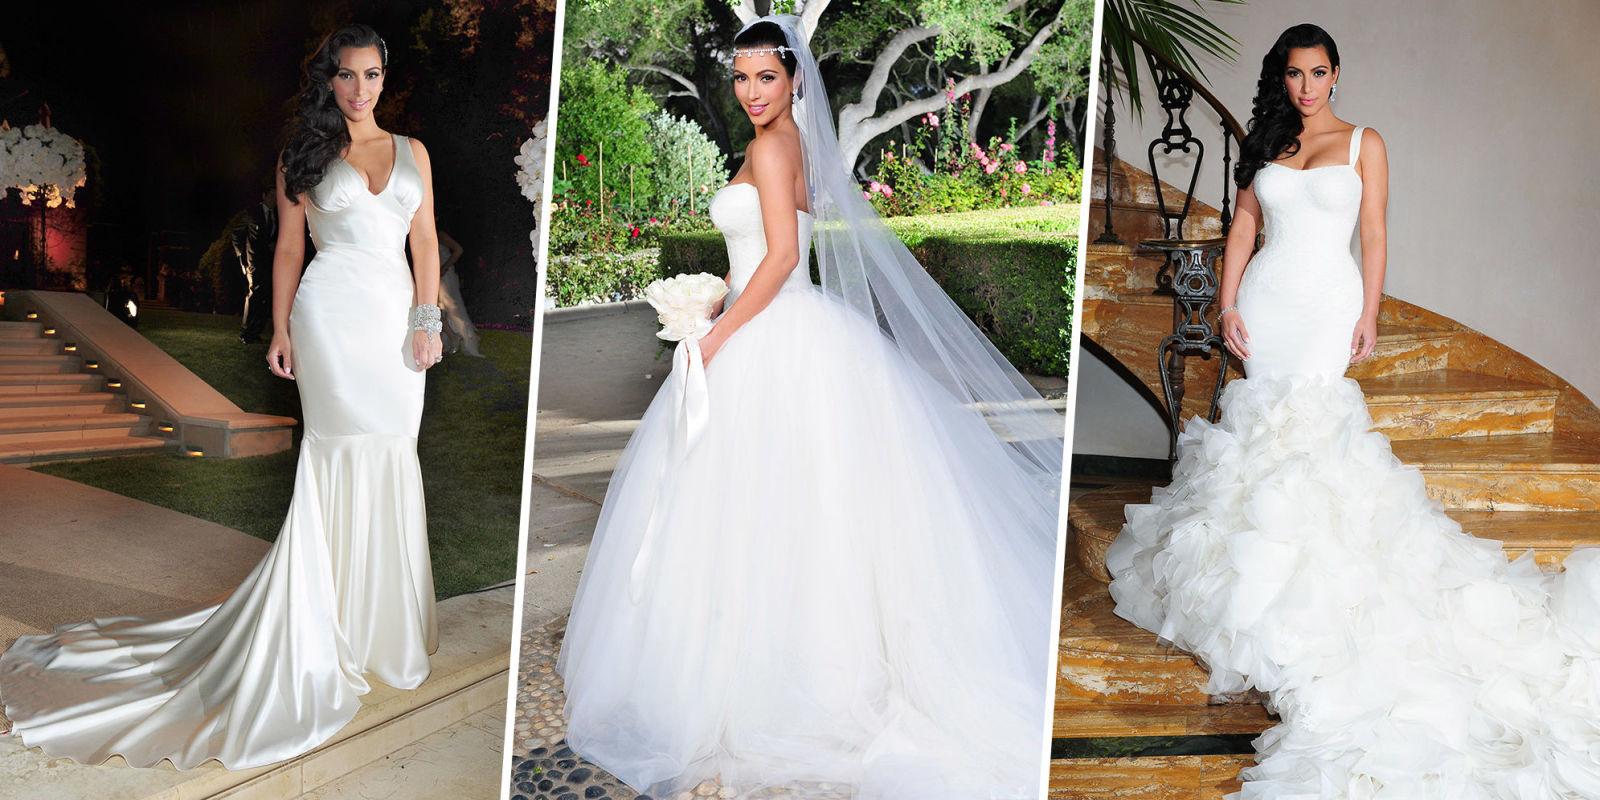 celeb wedding dresses photo - 1